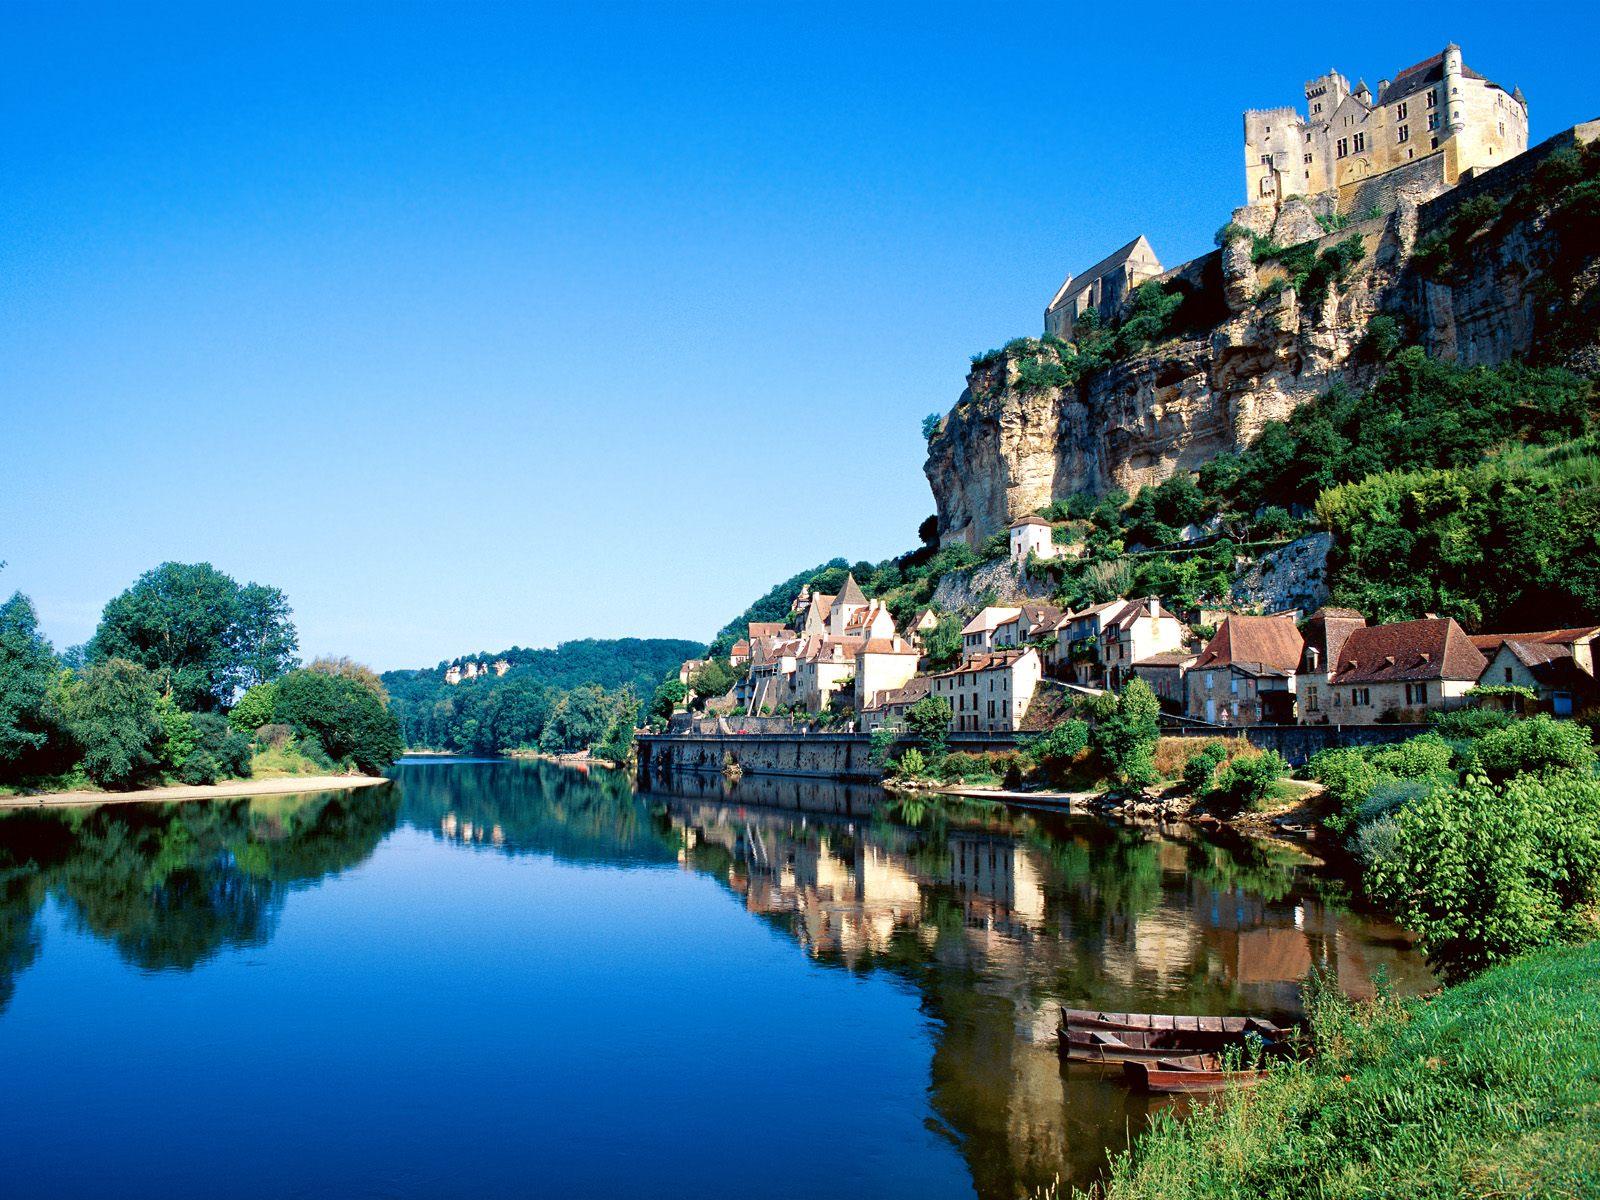 The Dordogne Property Market